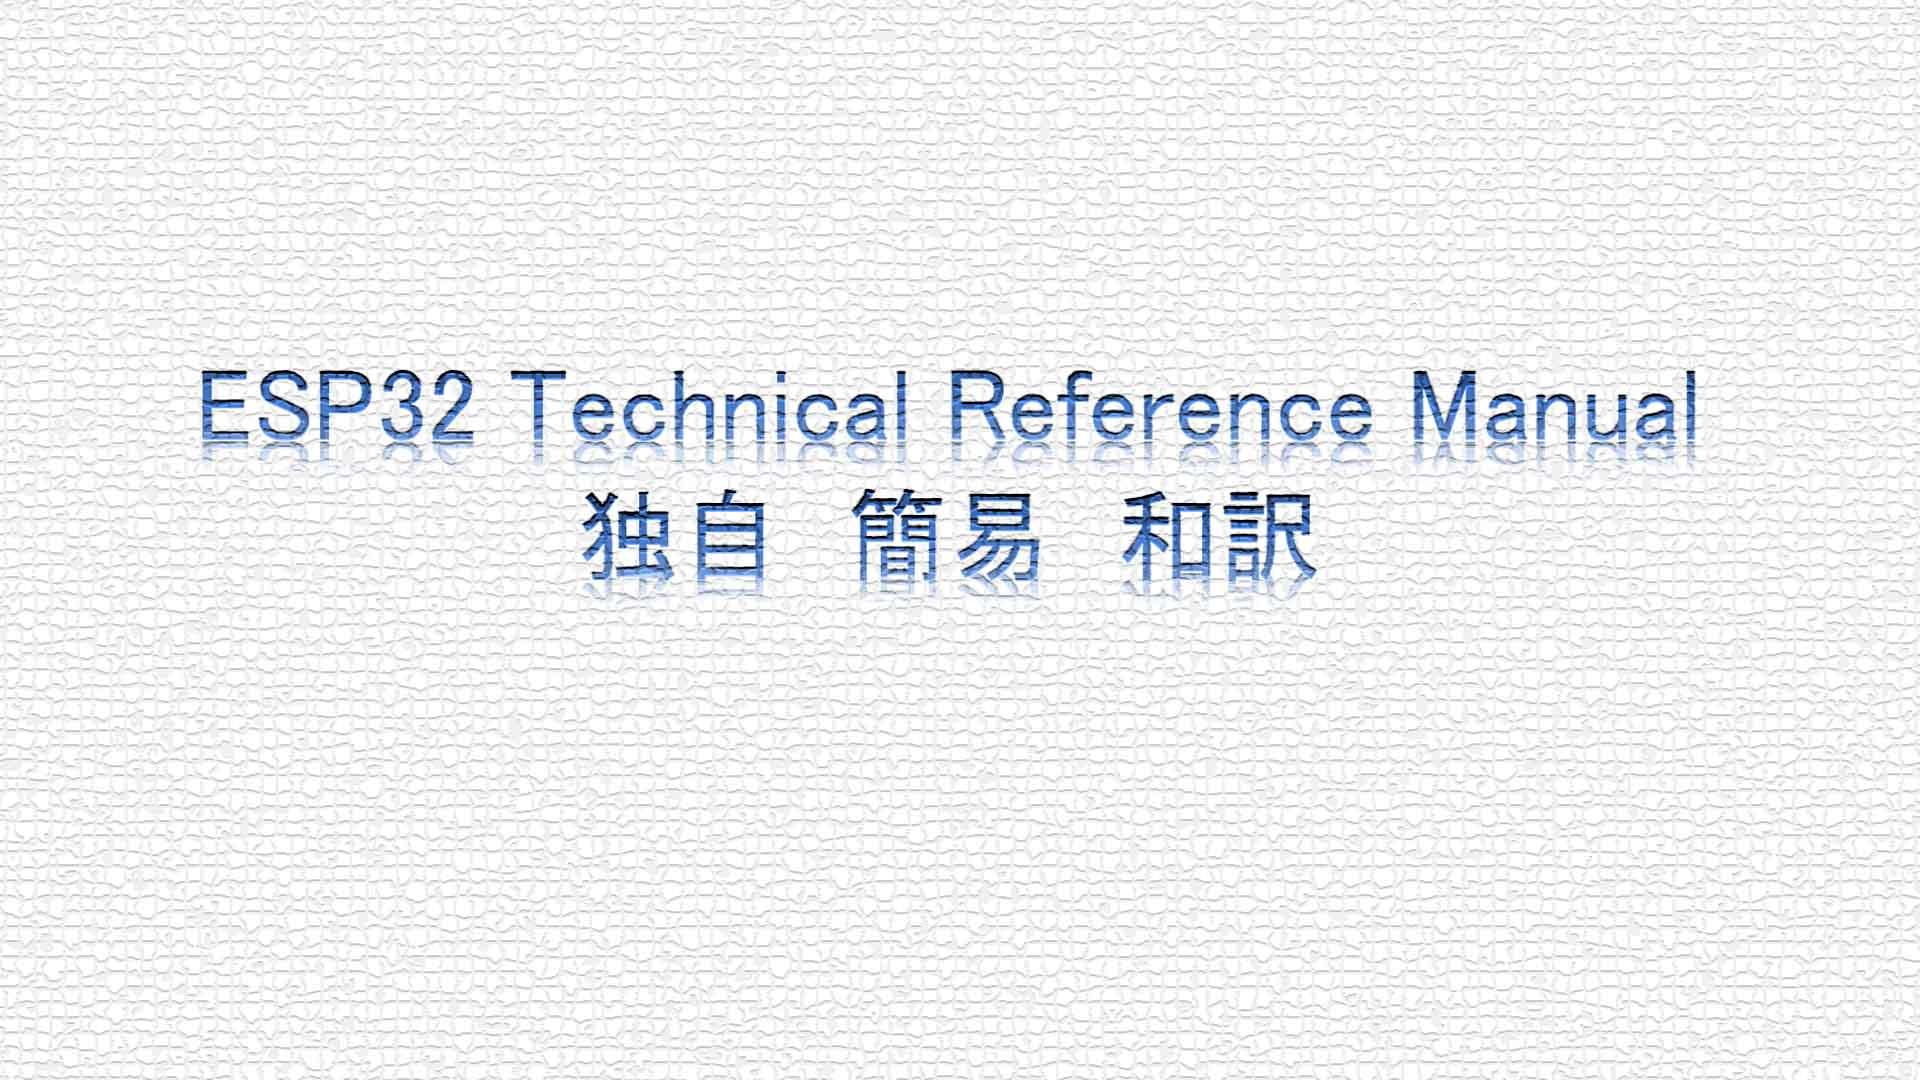 ESP32 Technical Reference Manual を独自に何となく和訳してみました。